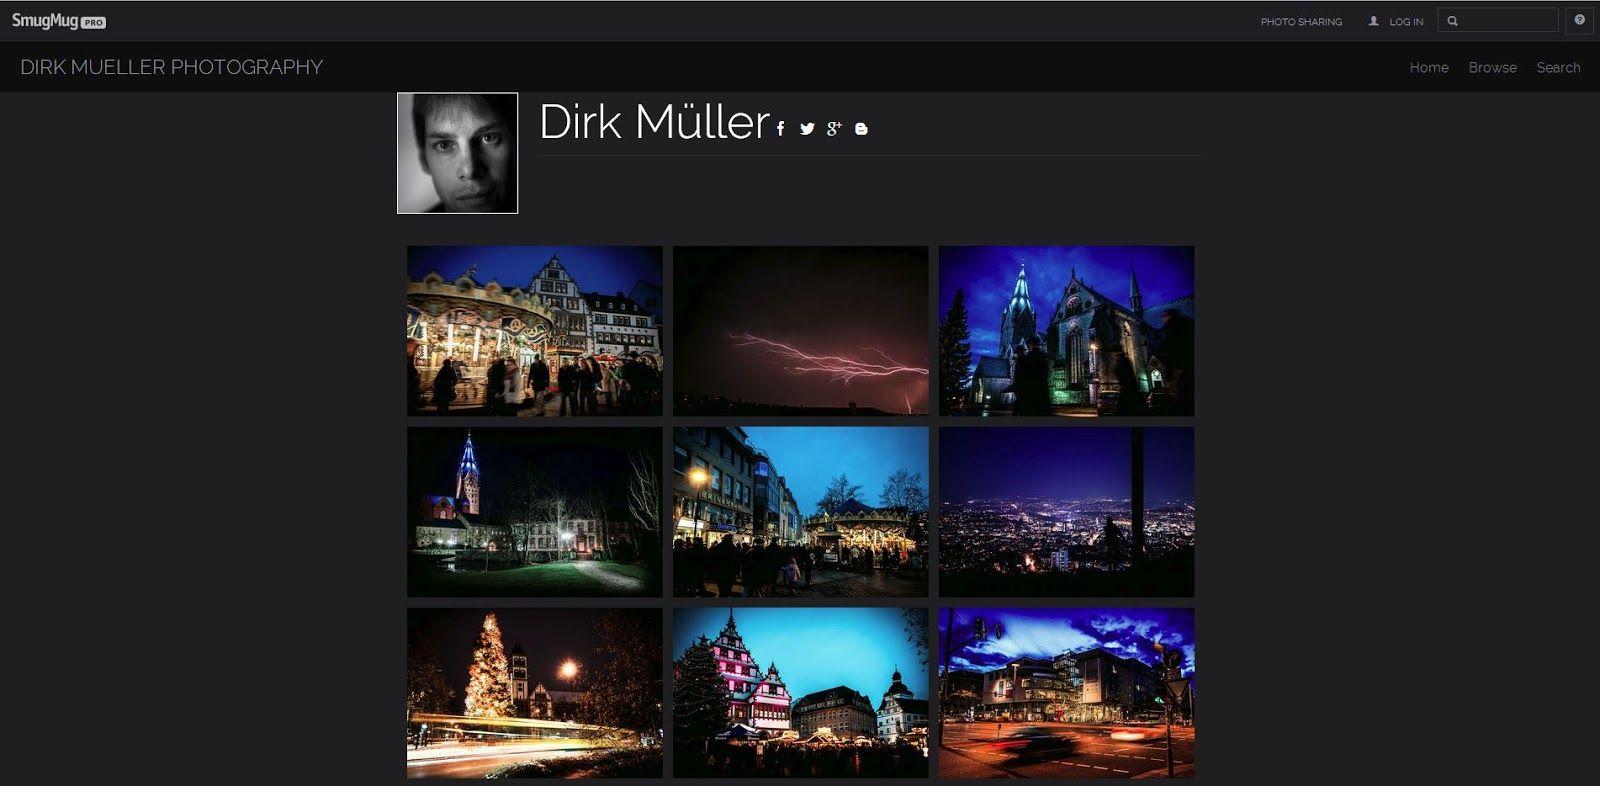 Dirk Mueller Photography: Hands On: SmugMug Pro Account besonders geeignet f...